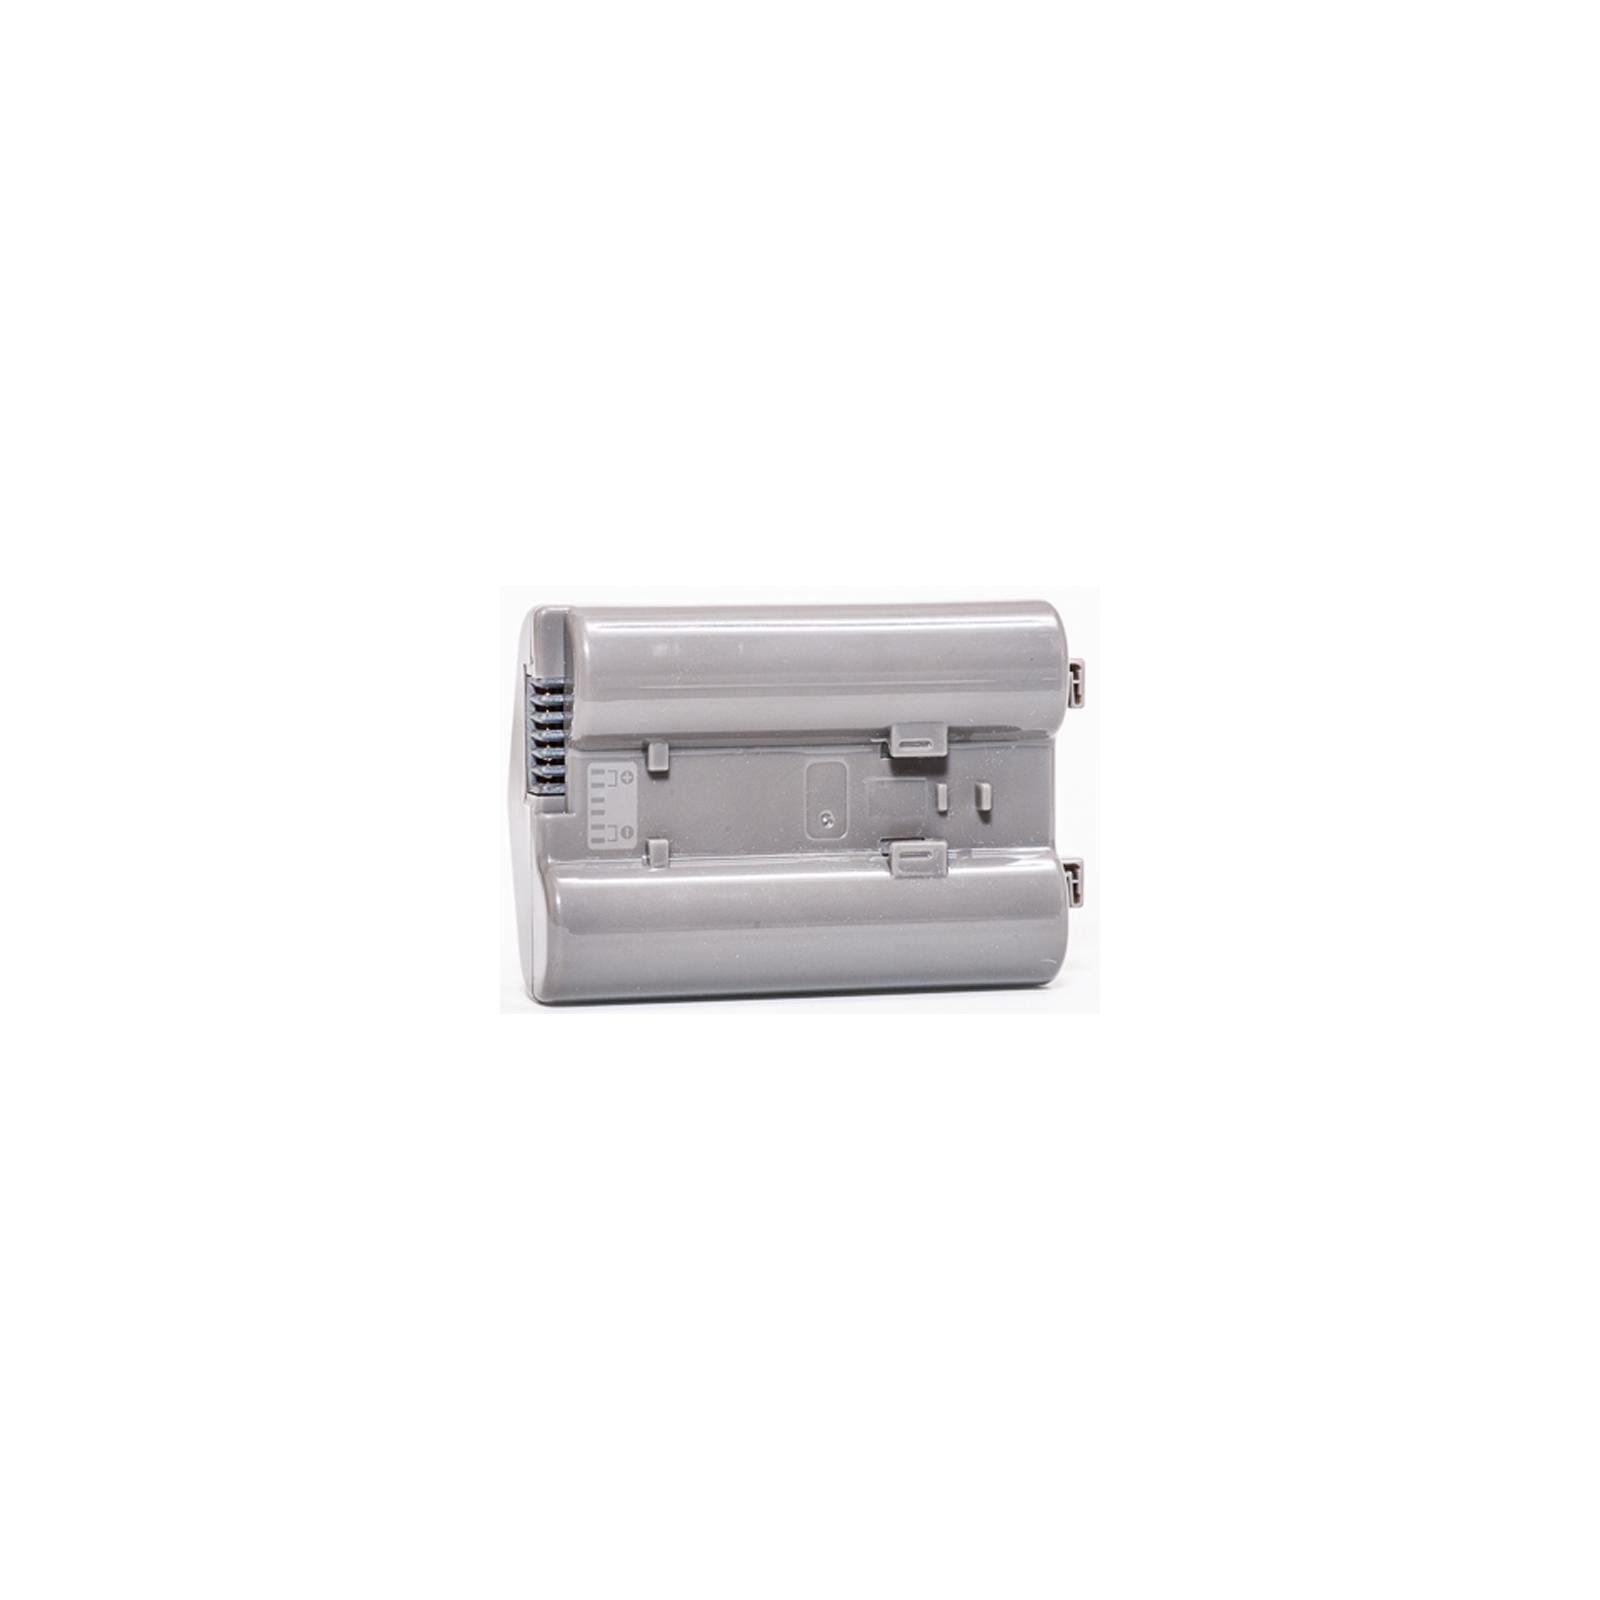 Аккумулятор к фото/видео PowerPlant Nikon EN-EL18 (DV00DV1335) изображение 2